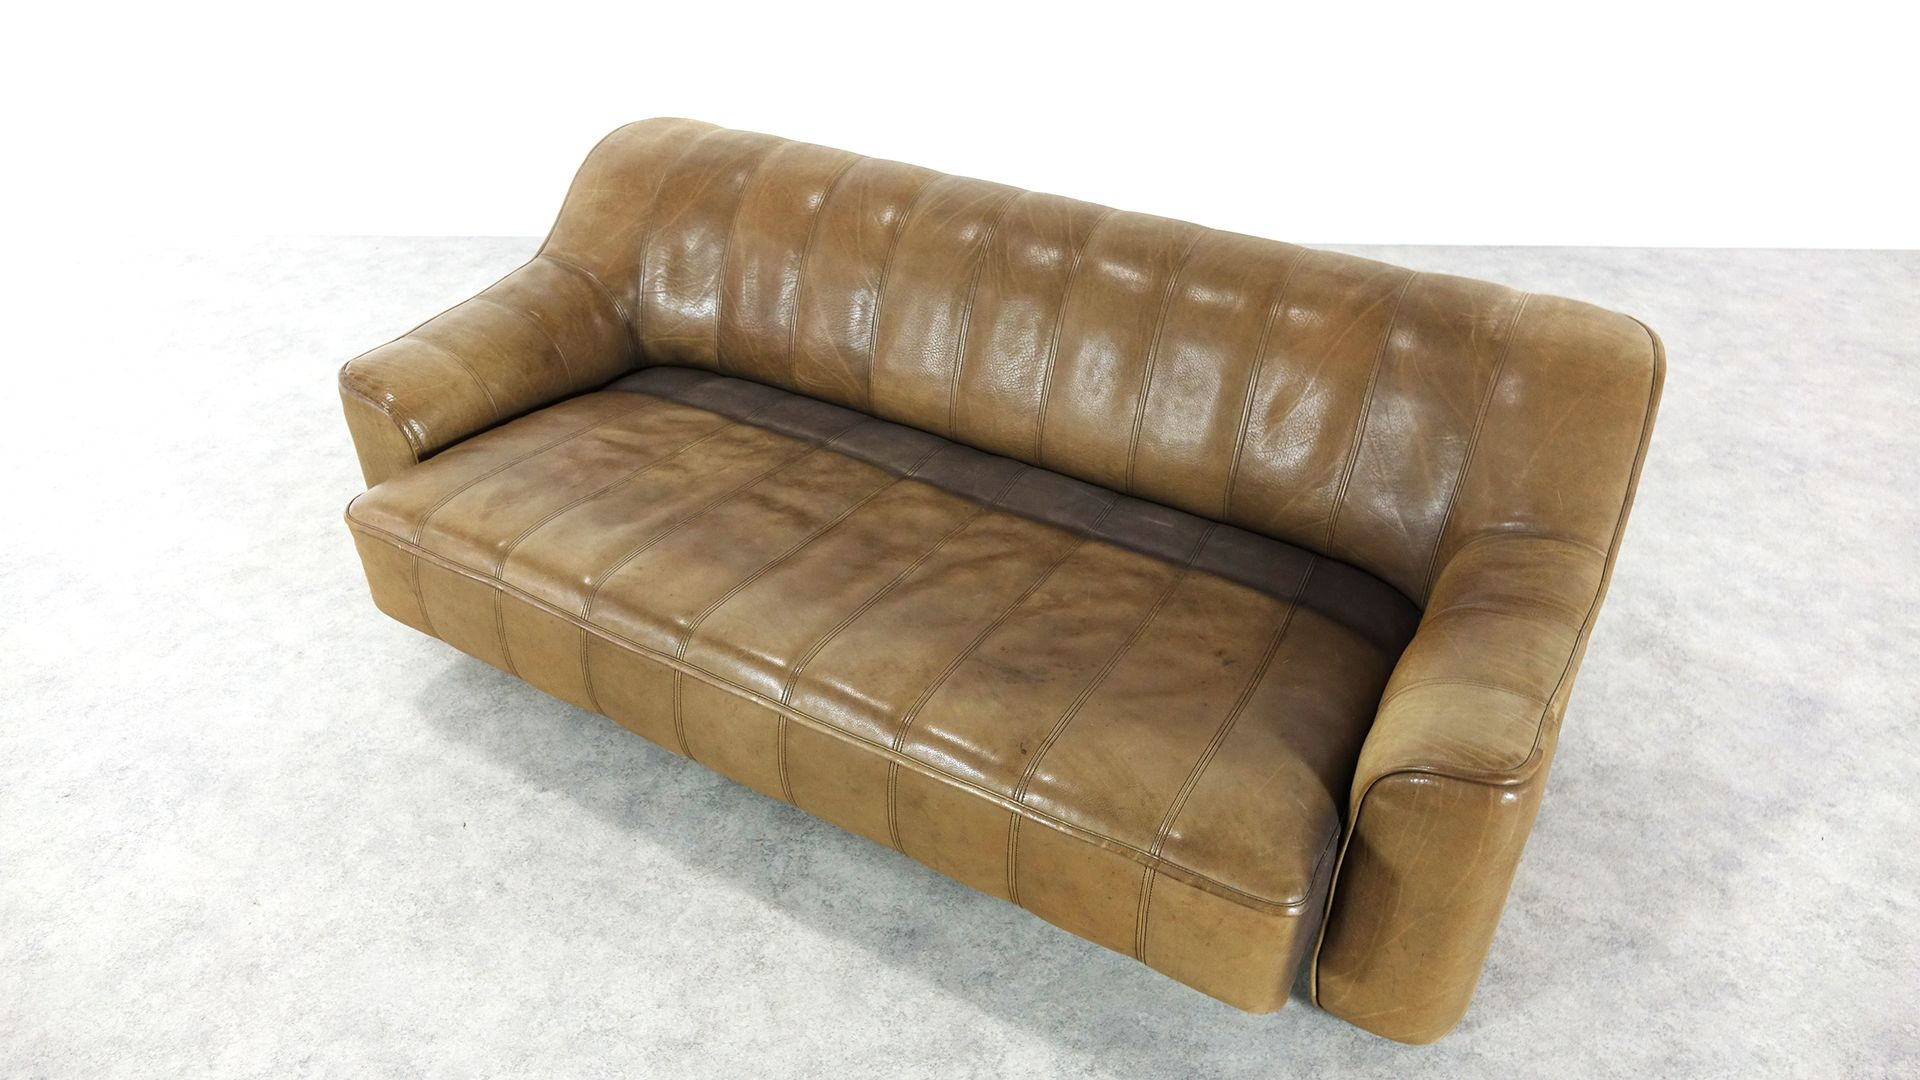 leder ds 44 3 sitzer schlafsofa von de sede 1970er bei pamono kaufen. Black Bedroom Furniture Sets. Home Design Ideas